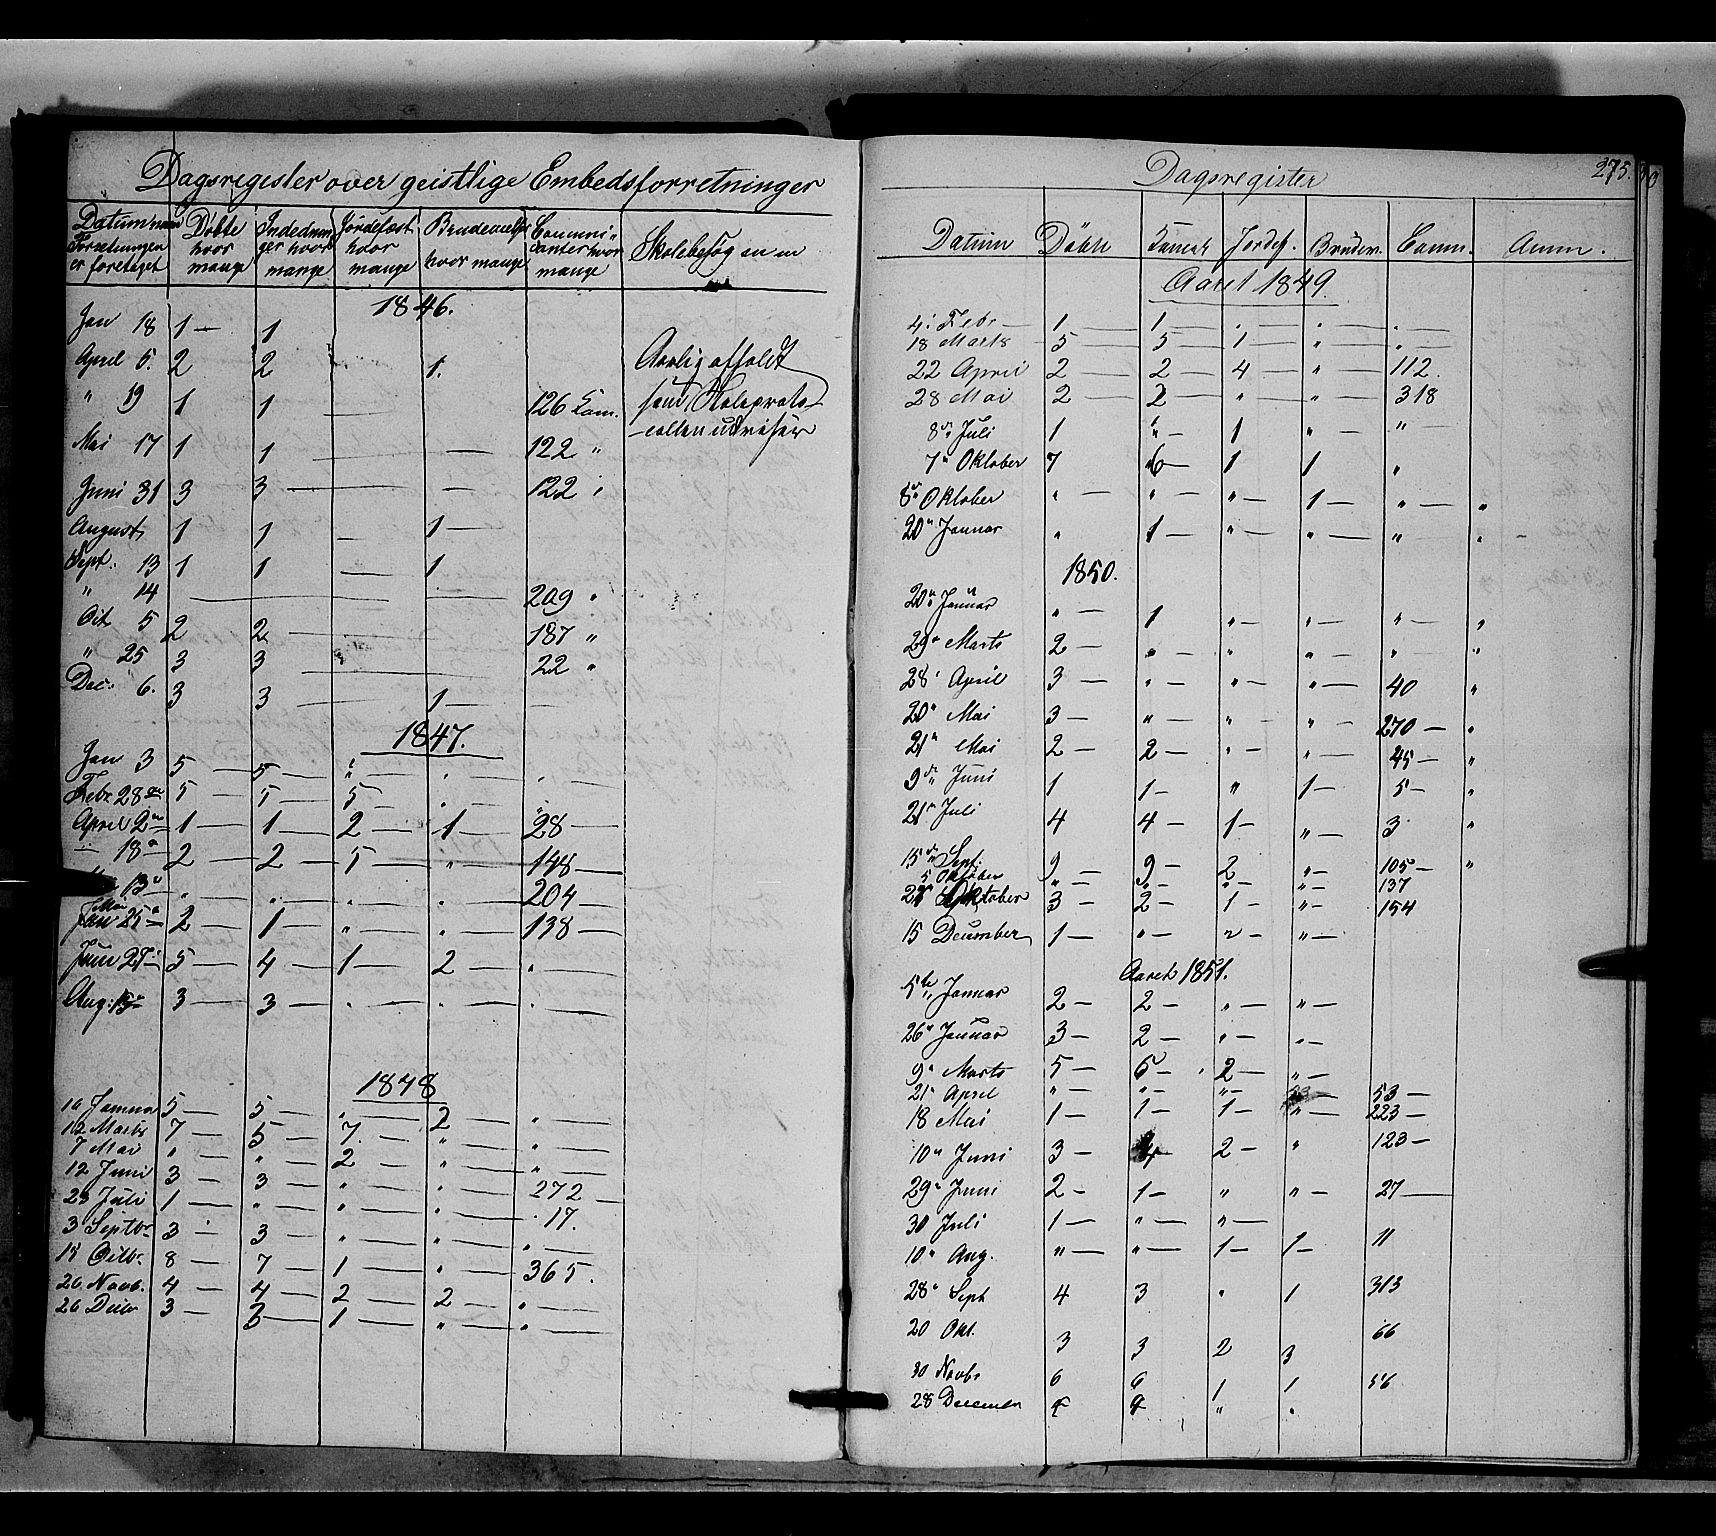 SAH, Nord-Aurdal prestekontor, Ministerialbok nr. 6, 1842-1863, s. 275